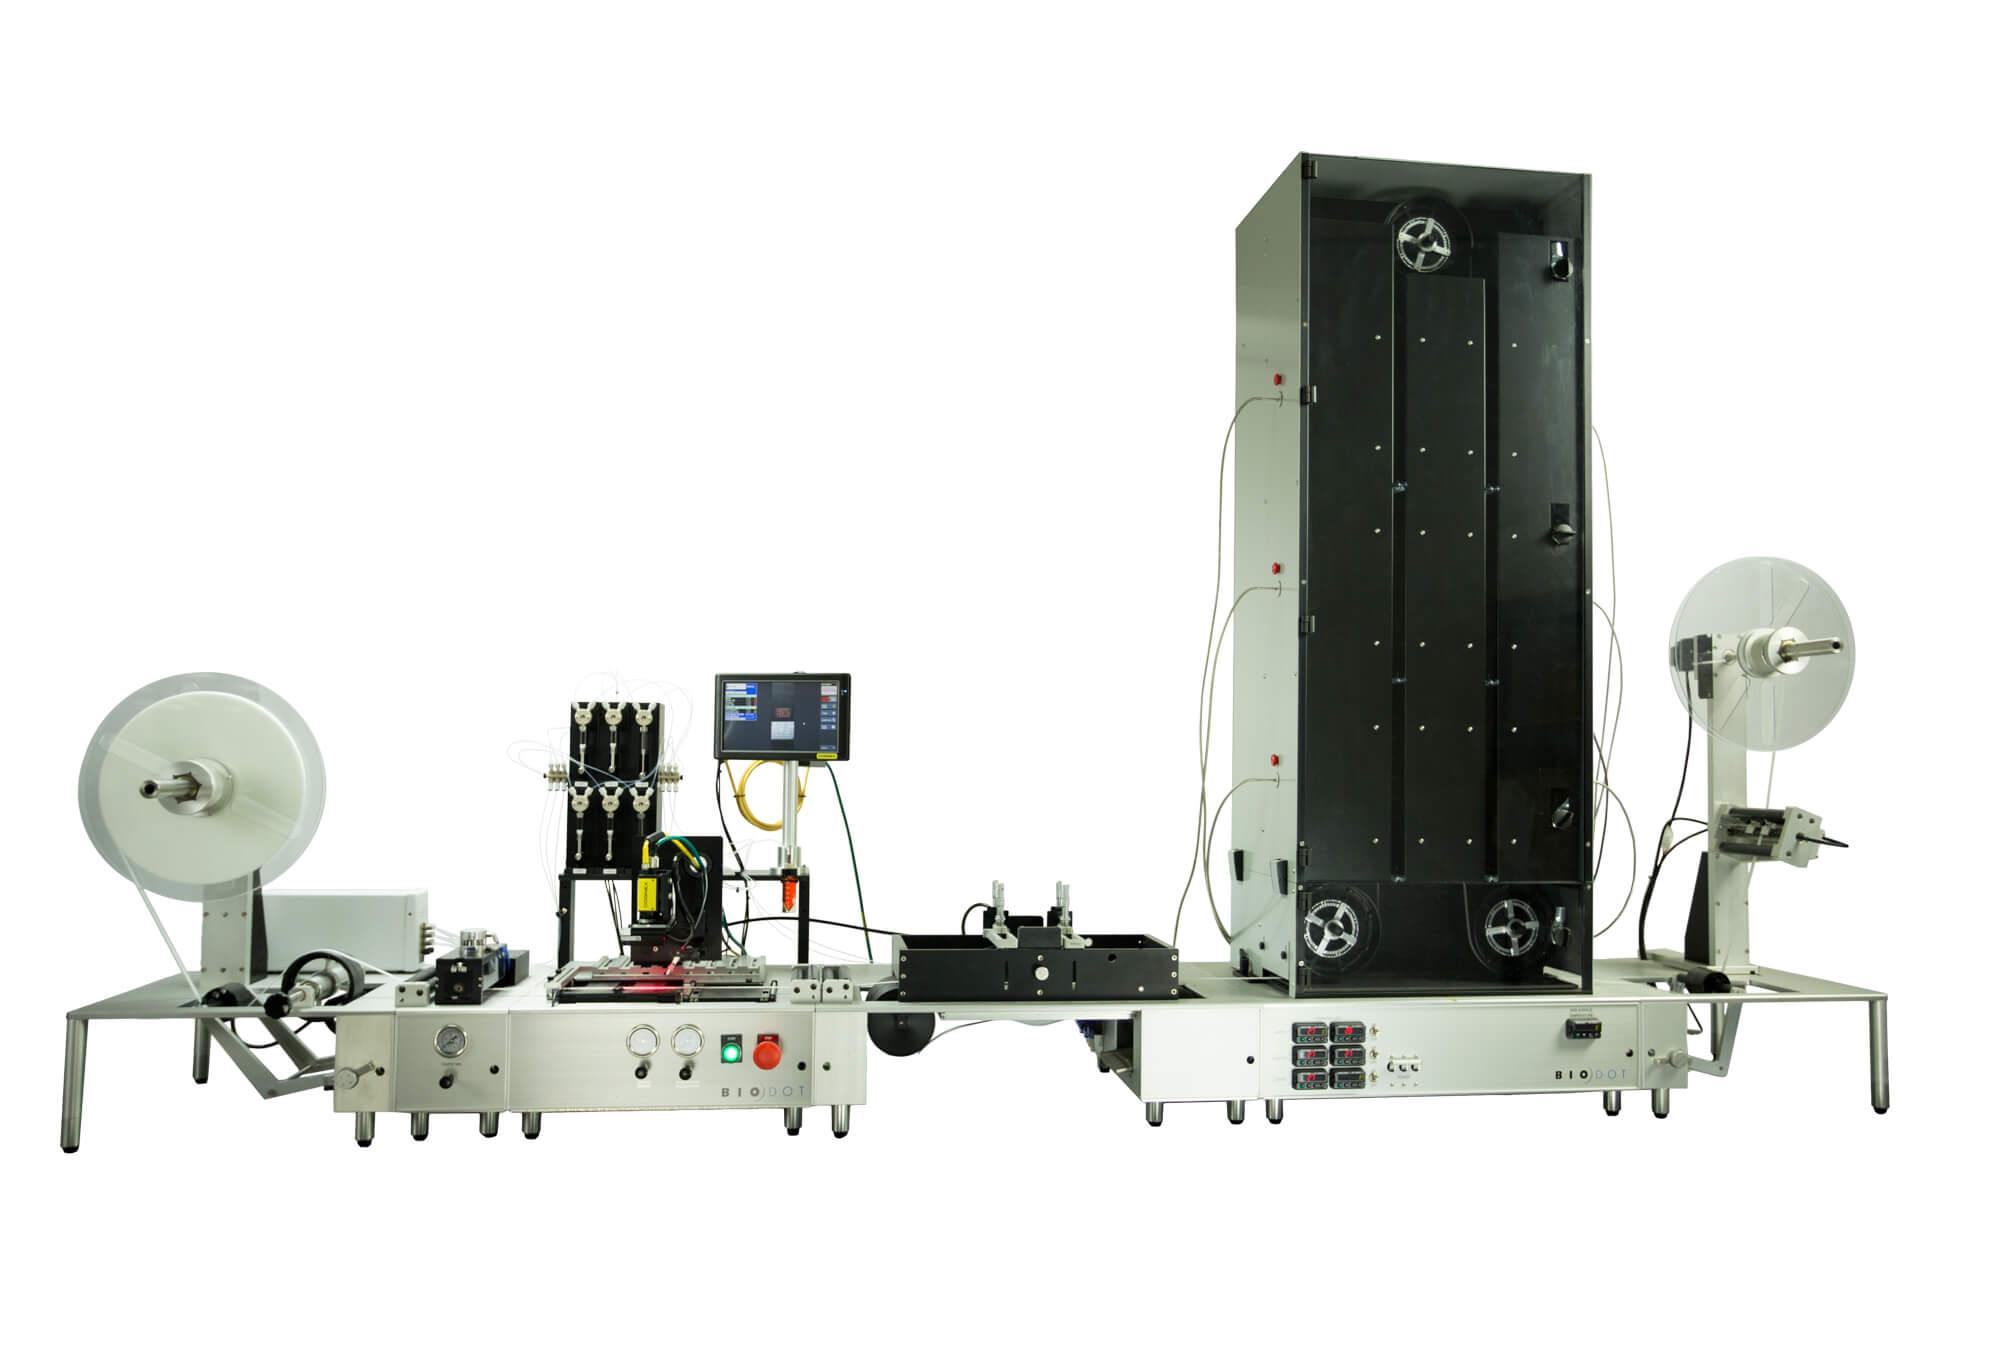 RR120 Web Handling Platform w/1 Dry Tower, 1 Dip Tank